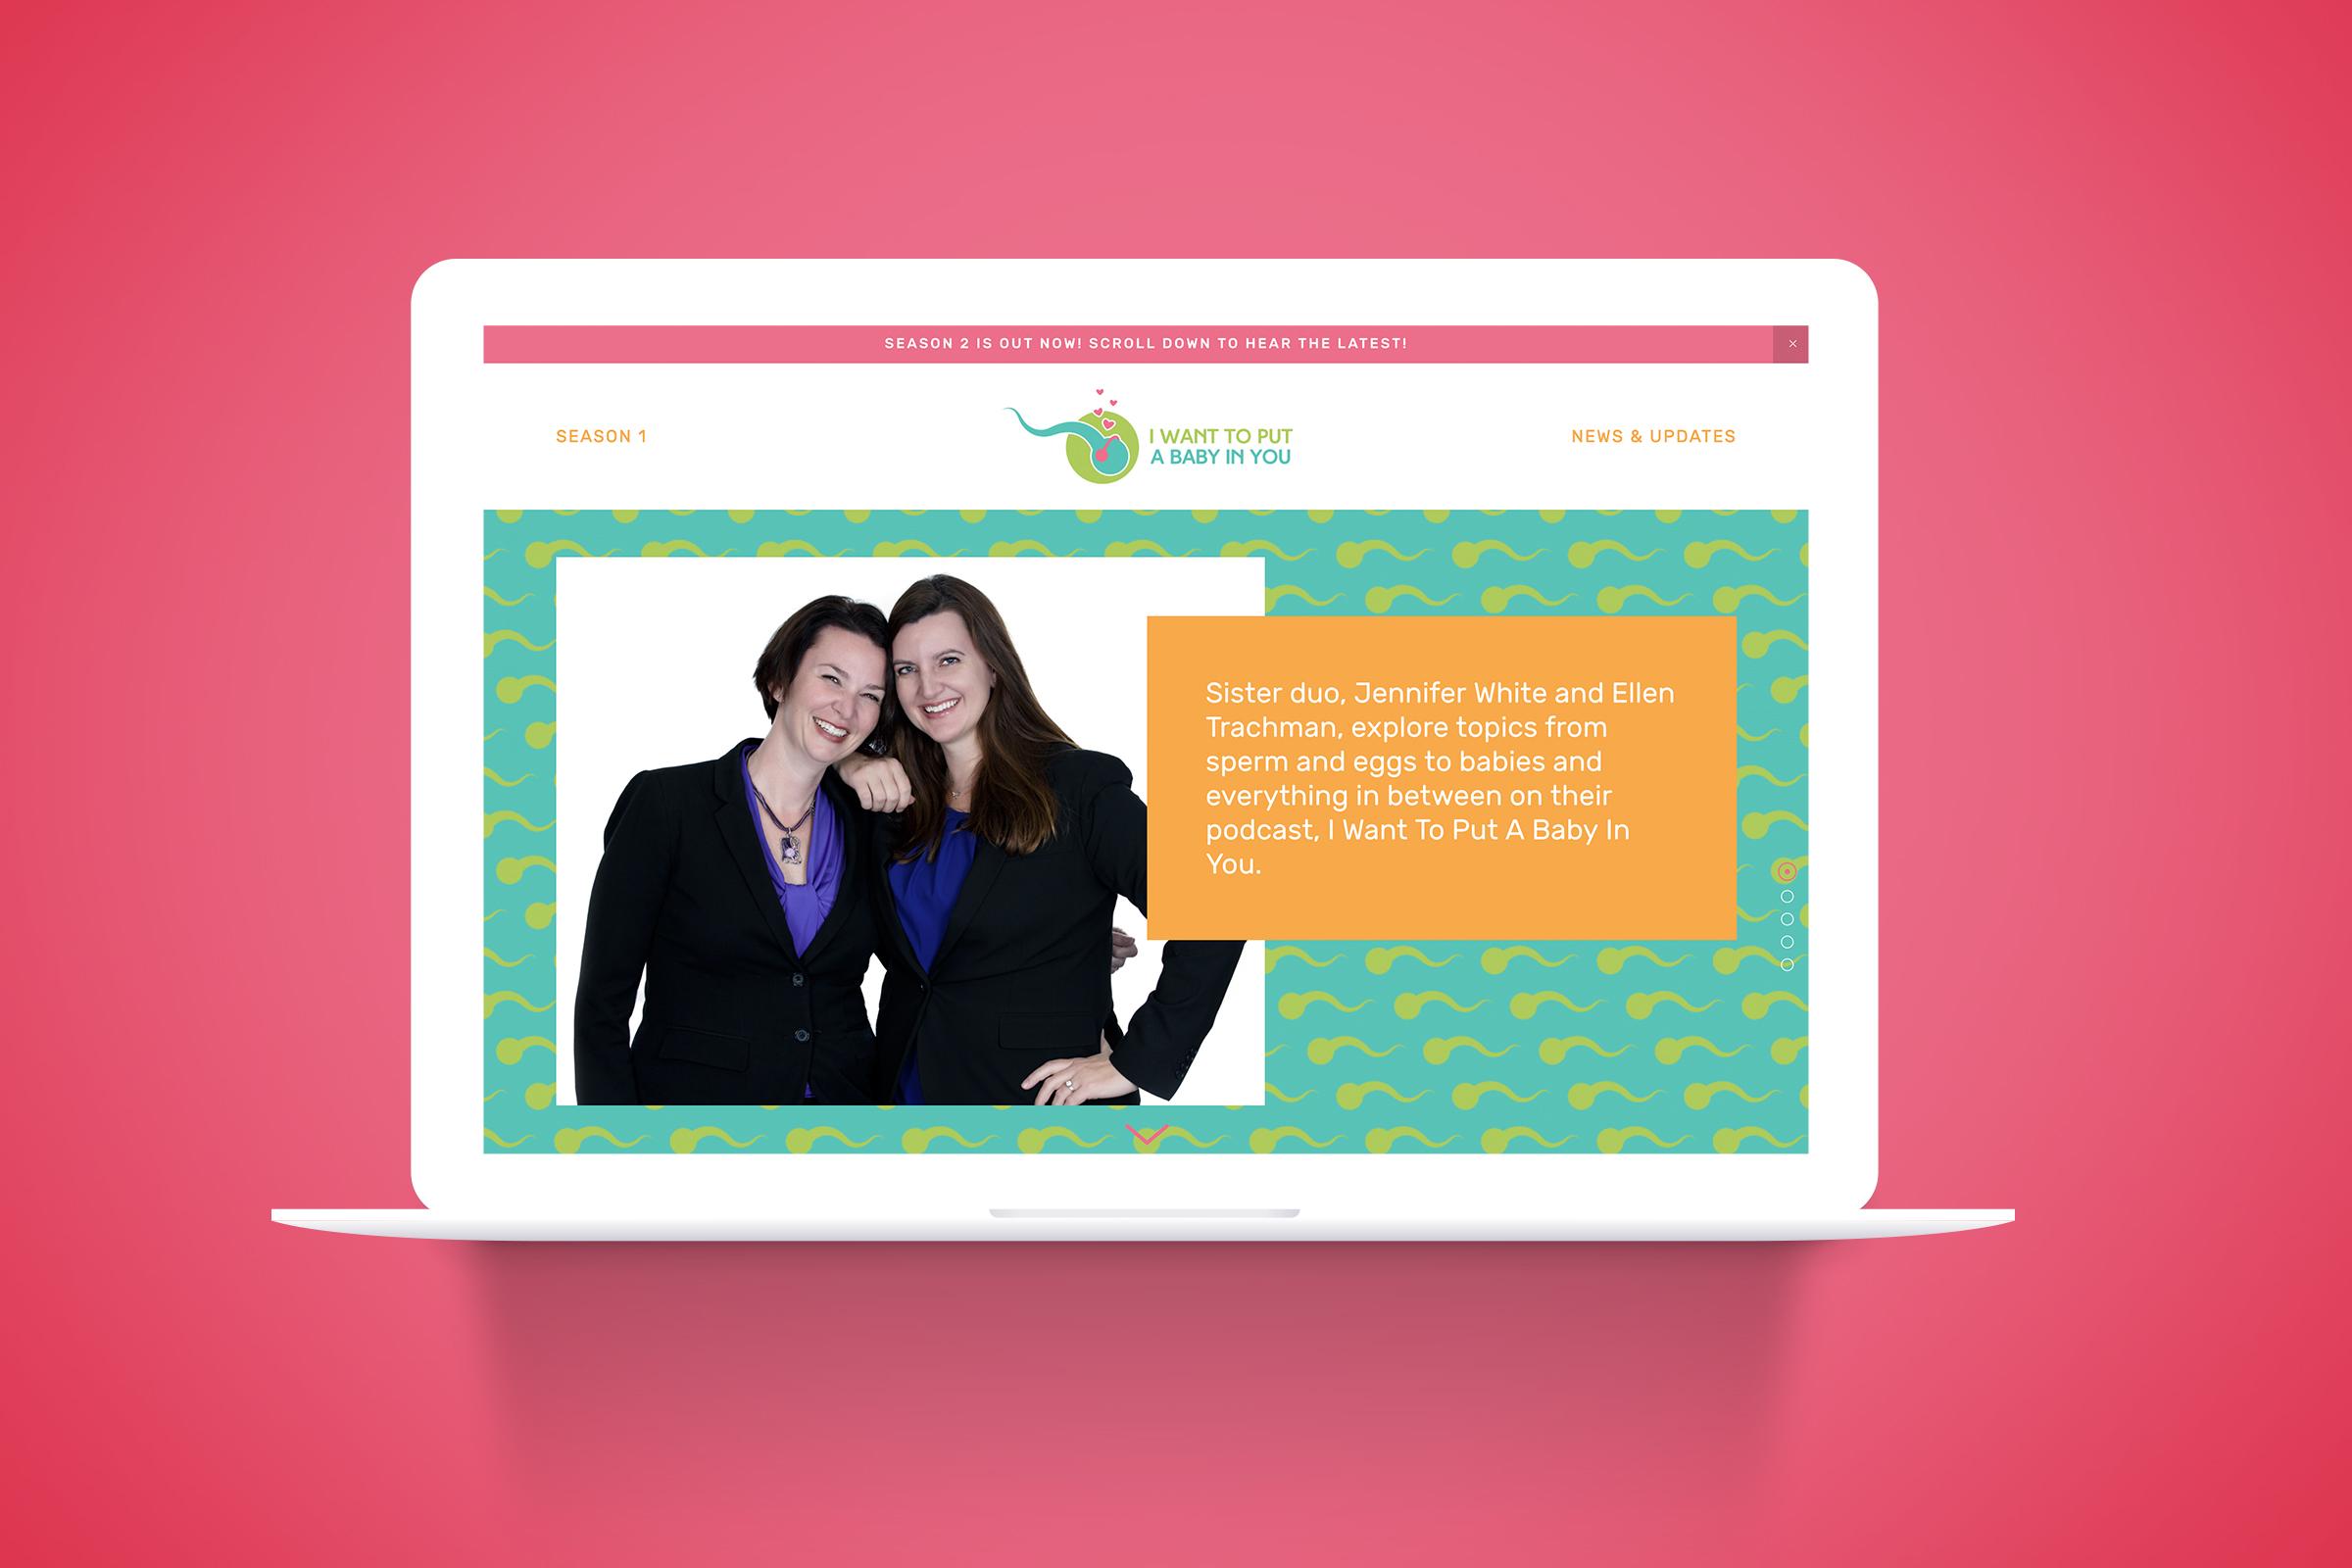 hearthfire-creative-website-designer-denver-colorado-i-want-to-put-a-baby-in-you-1.jpg